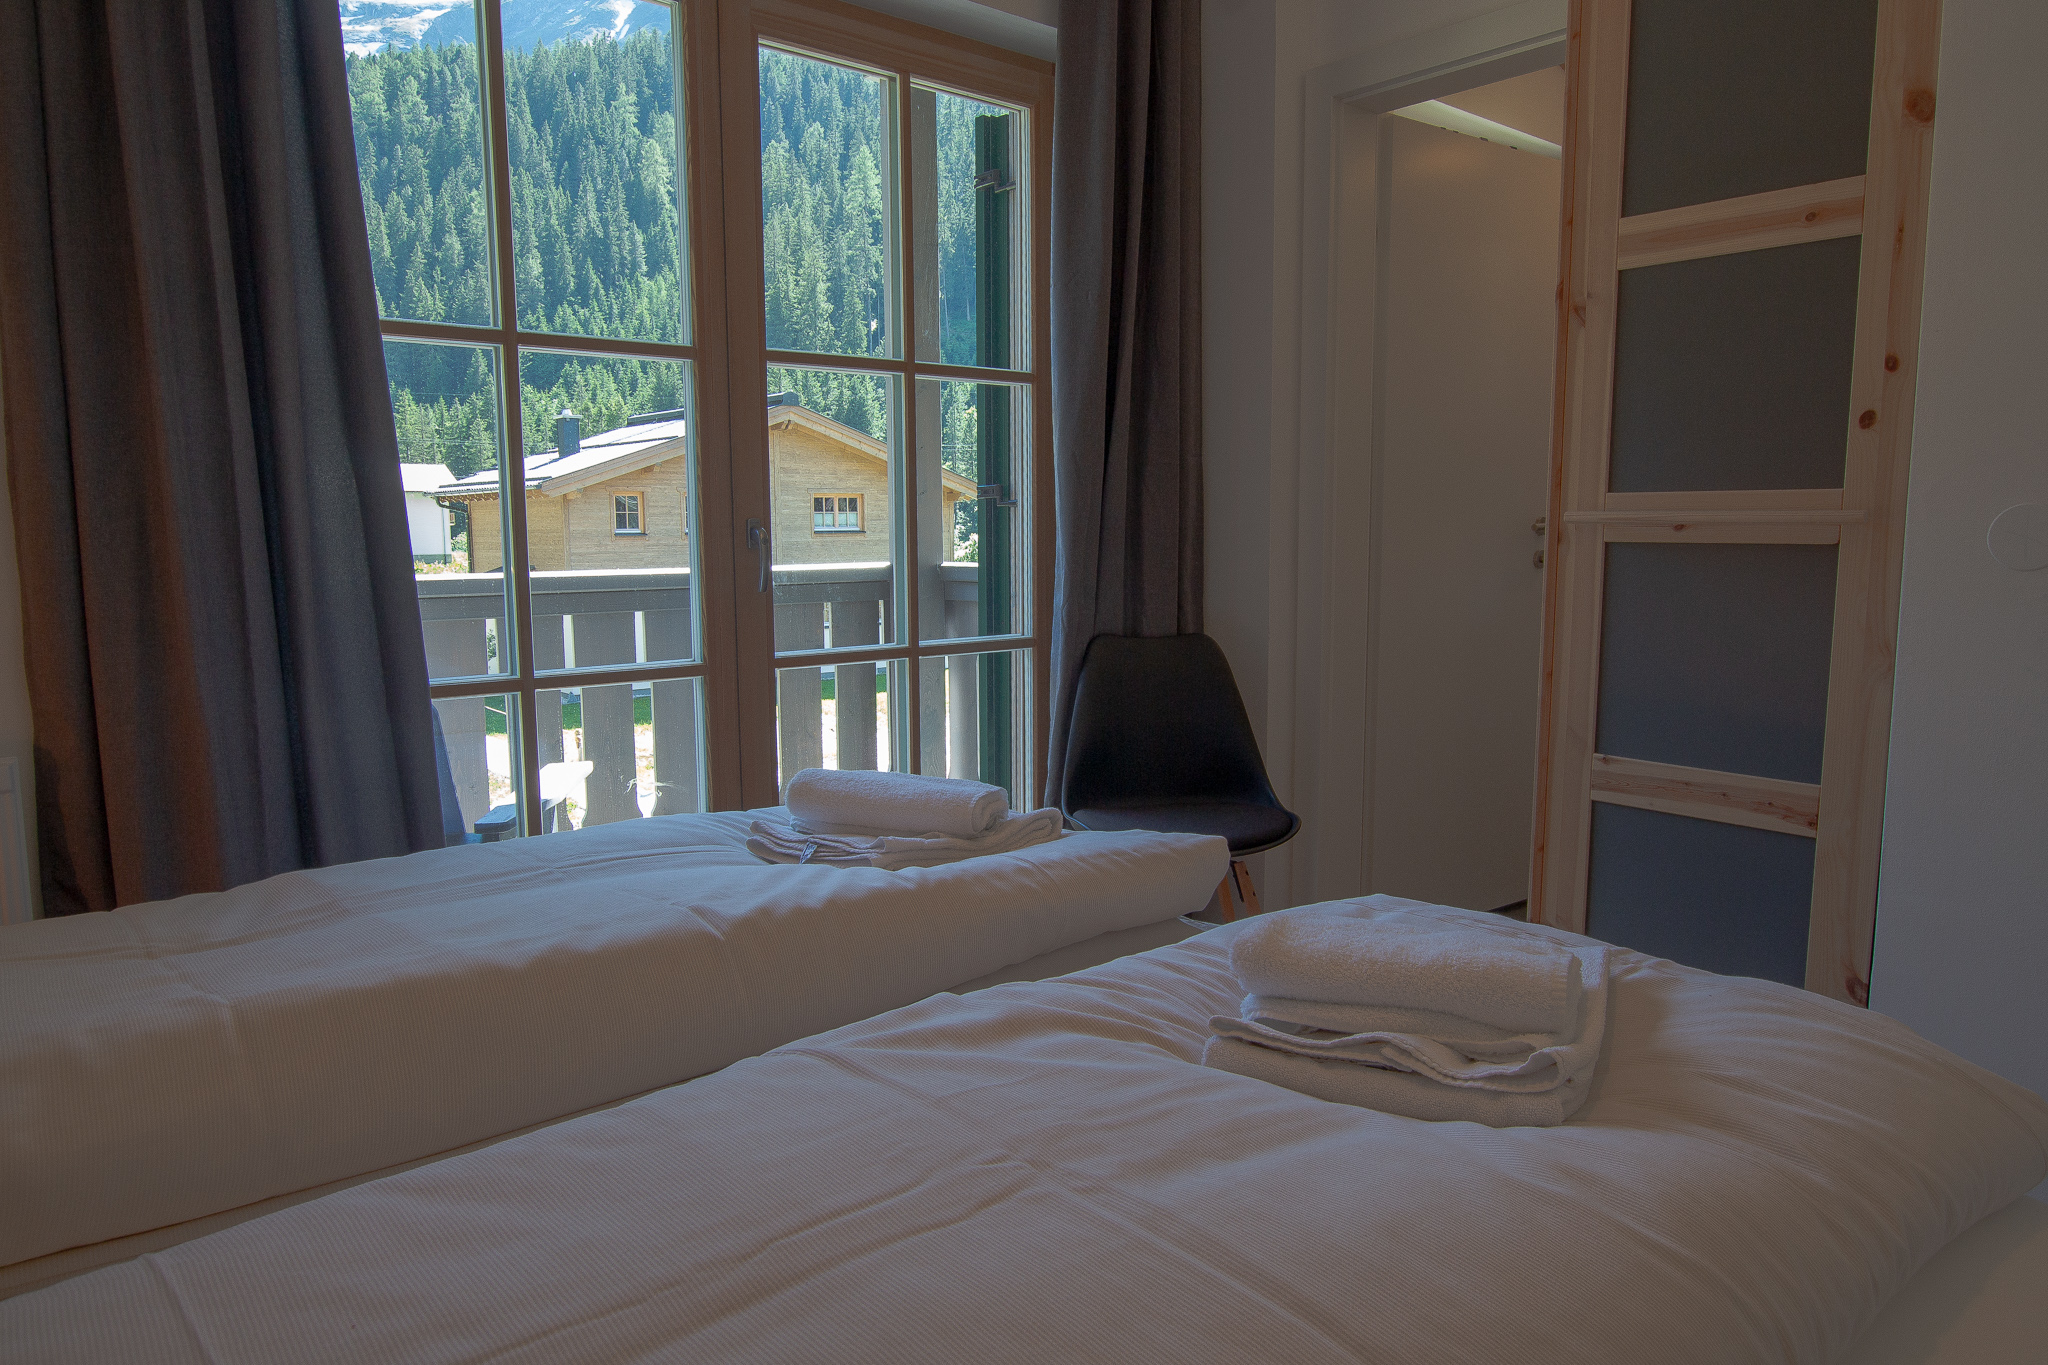 Maison de vacances Lodge Seeblick am Skilift und Bergsee für 5 (2636751), Uttendorf, Pinzgau, Salzbourg, Autriche, image 11